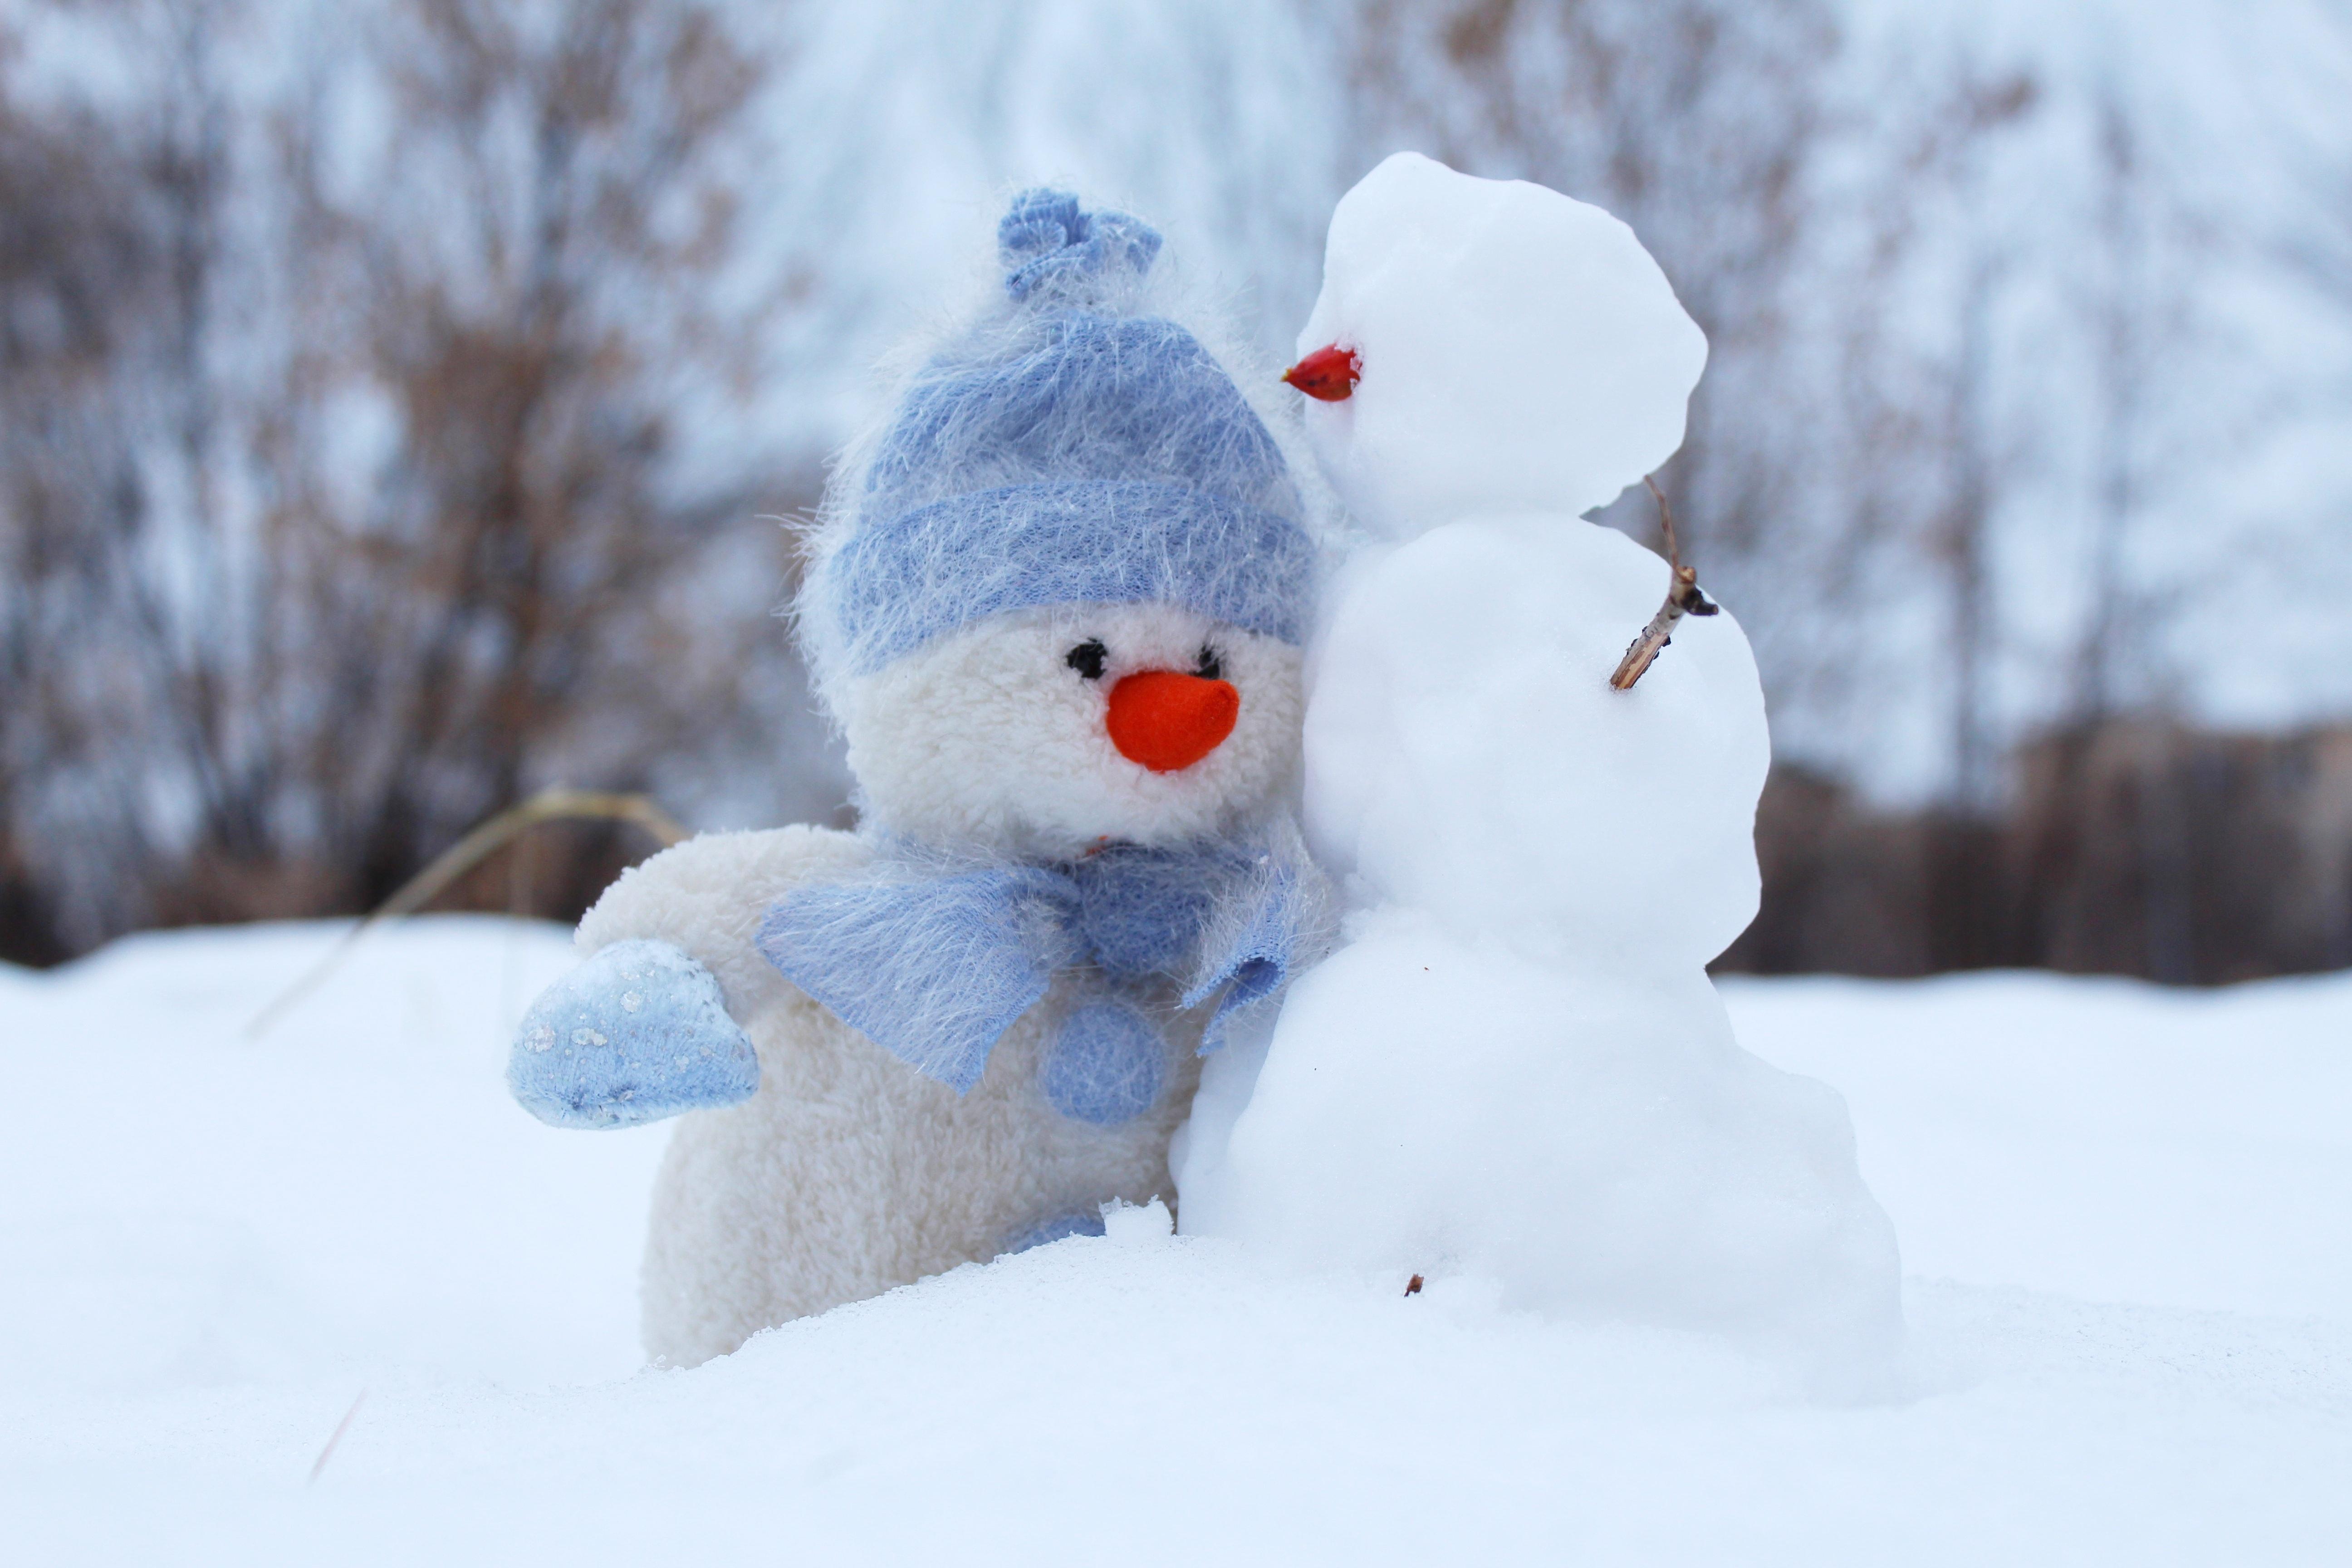 snowmen_stuffed n real_pexels-photo-269370